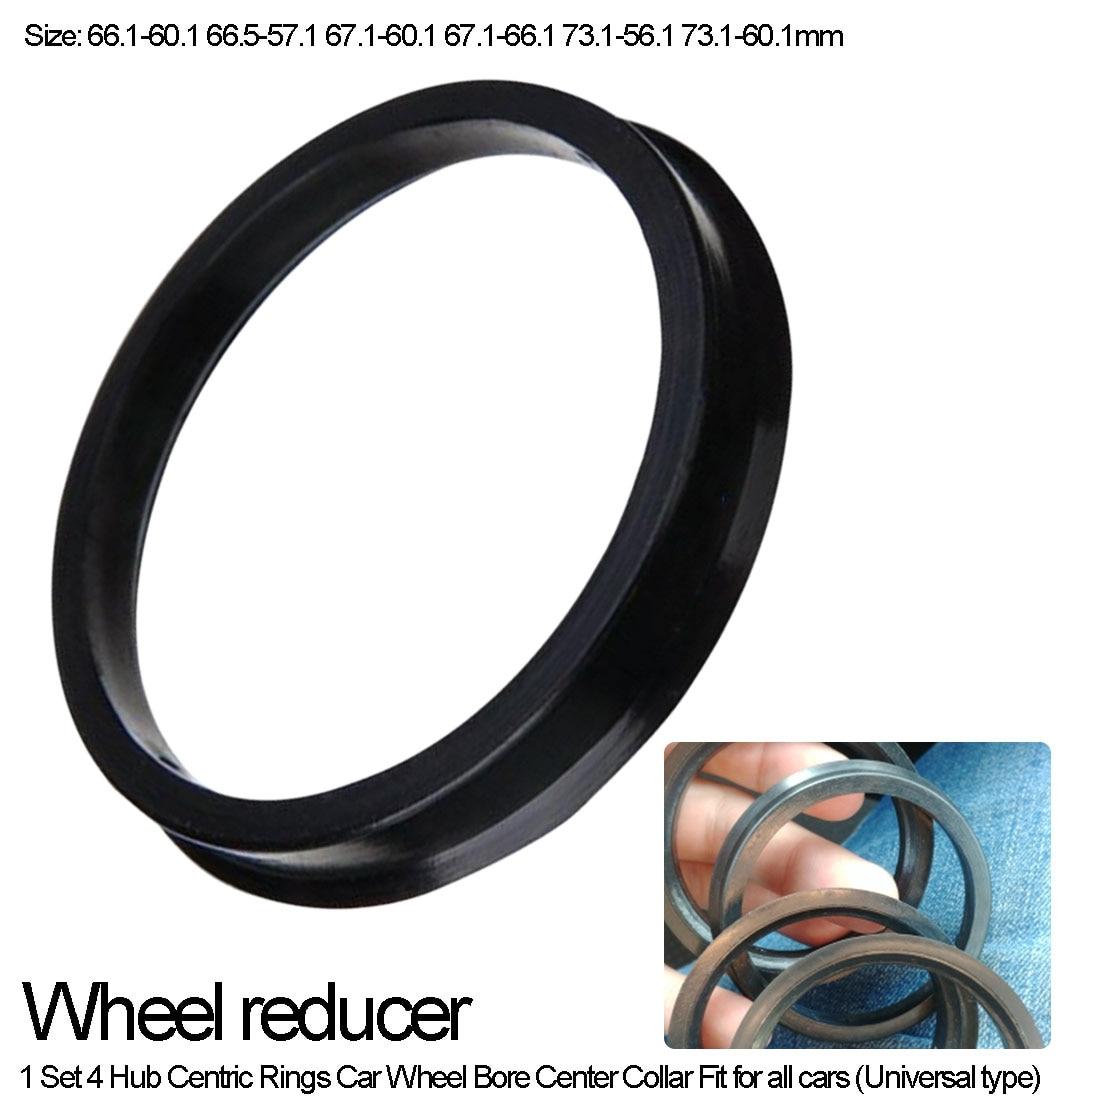 Hub Reducer Center Hole Collar Ring  Plastic 4pcs Car Wheel Bore Center Collar 66.1-60.1 66.5-57.1 67.1-60.1 67.1-66.1mm